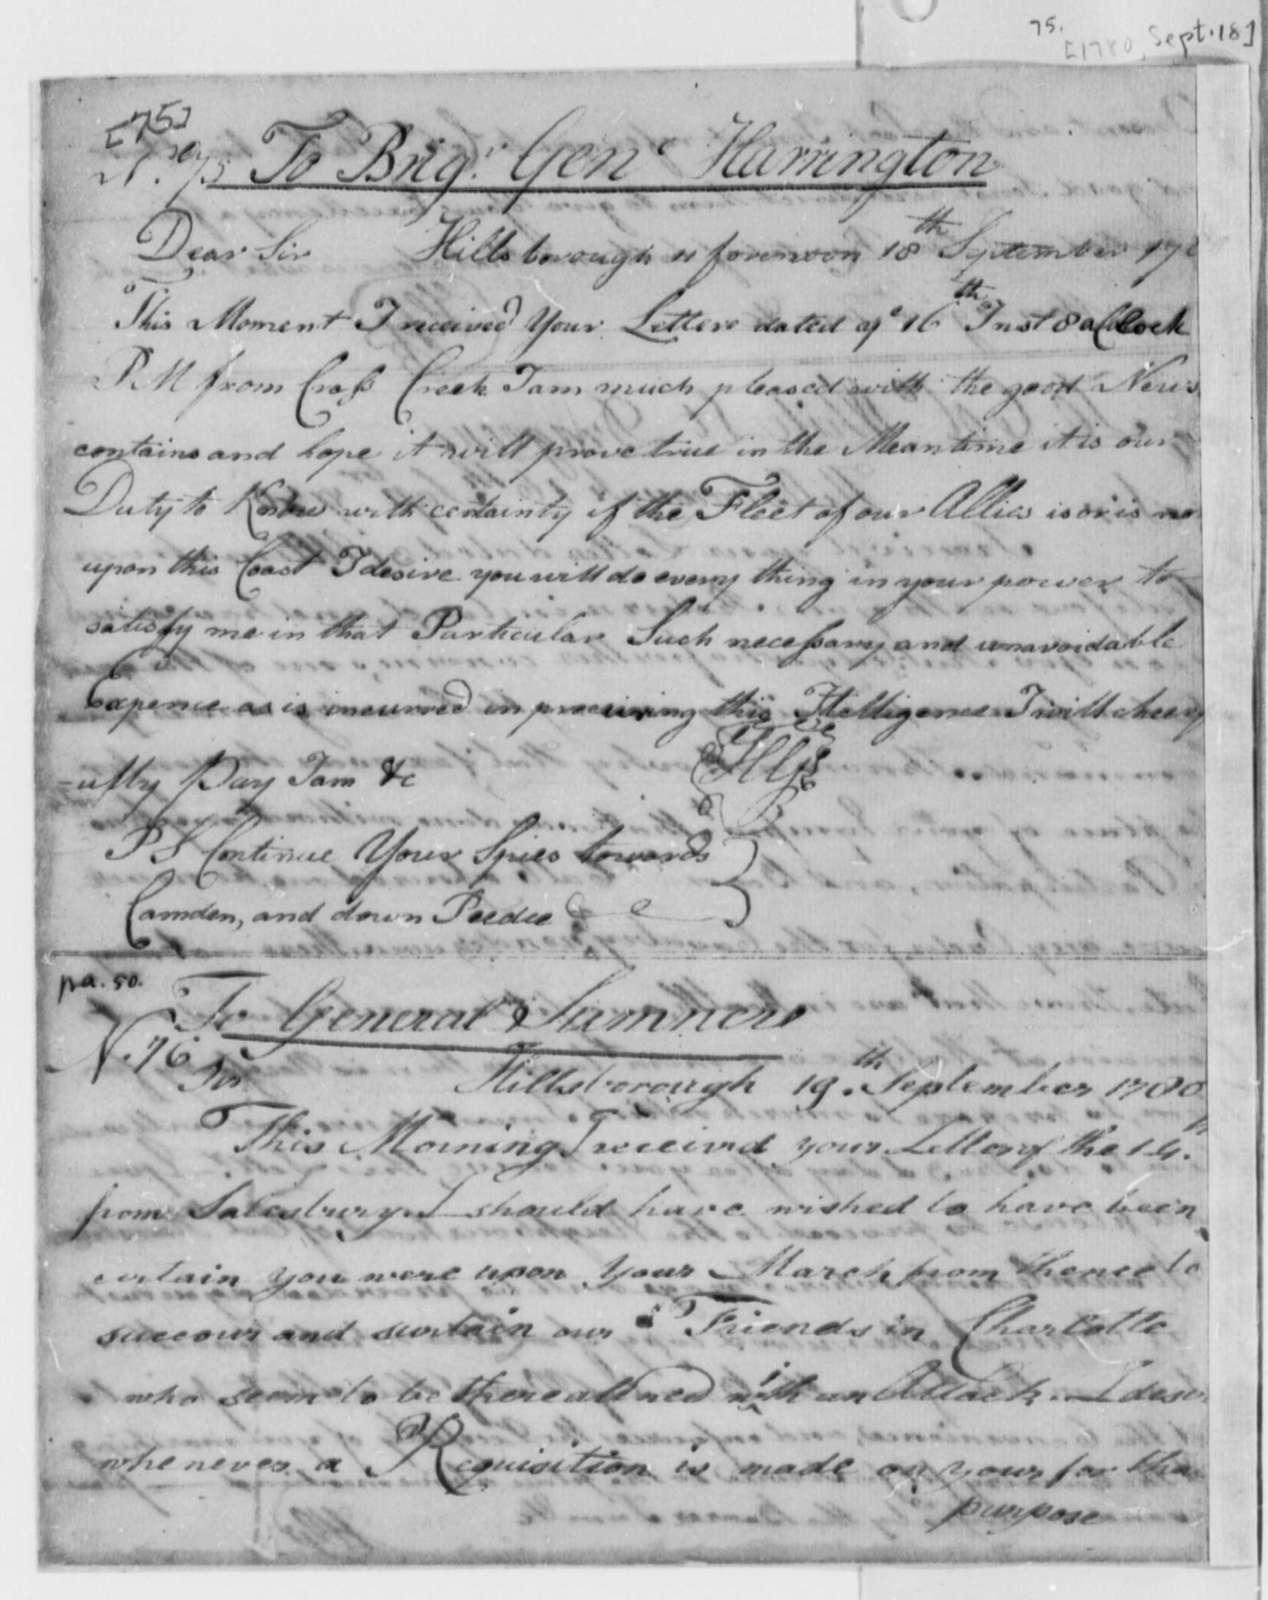 Horatio Gates to W. H. Harrington, September 18, 1780